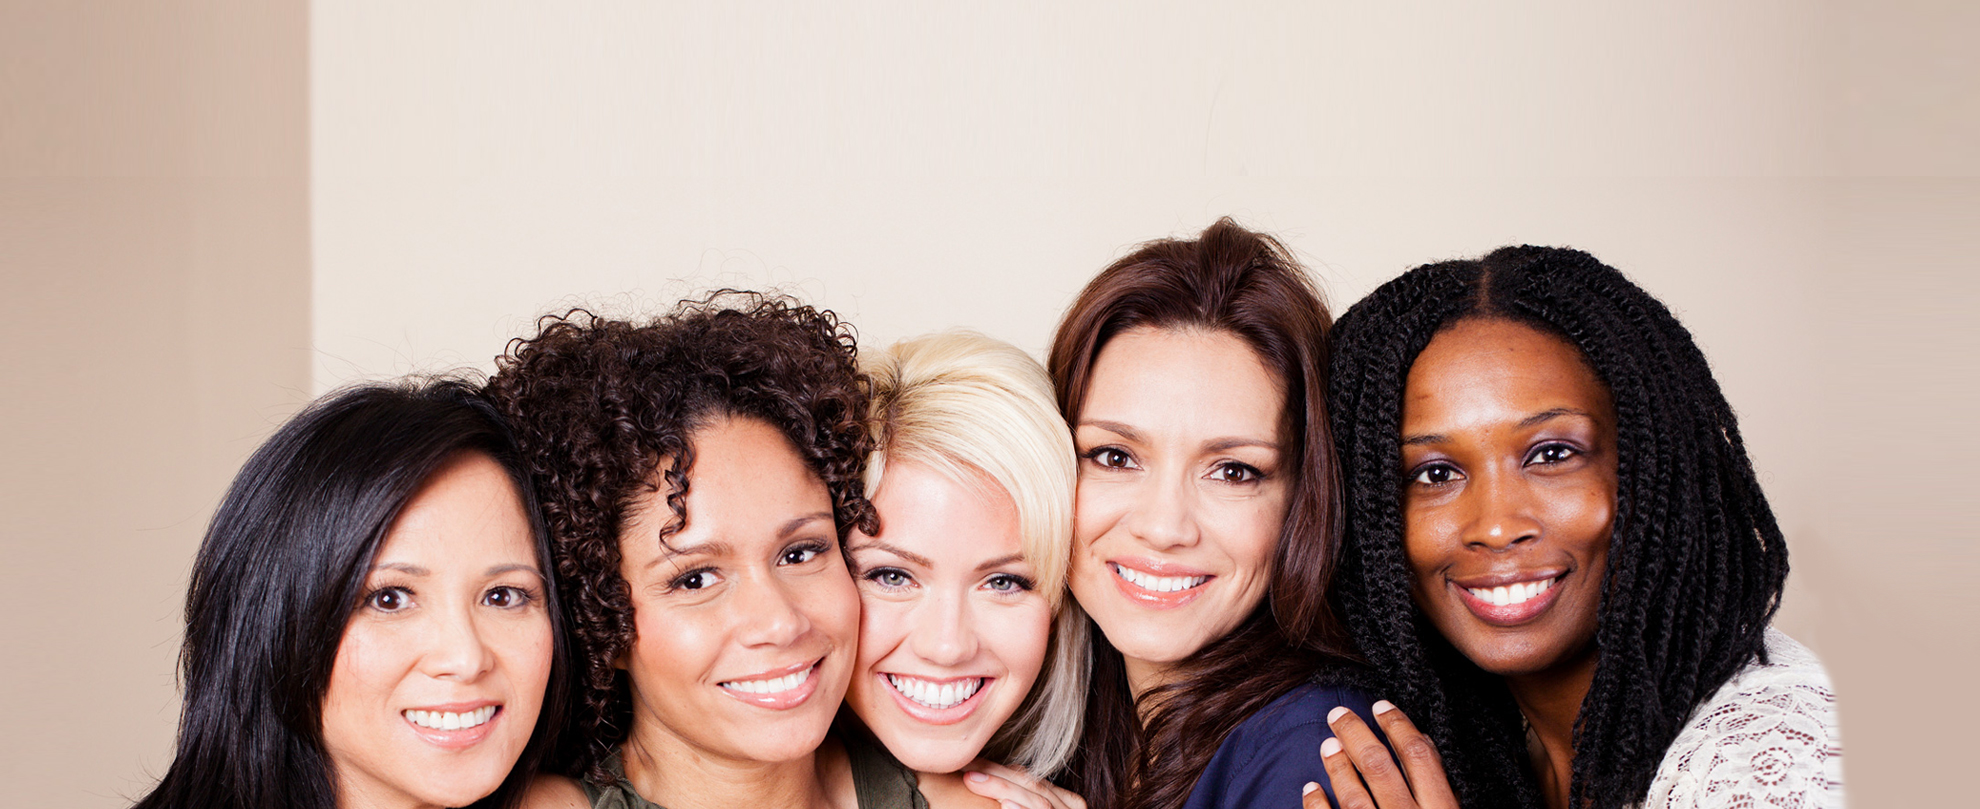 Levin's Women's Health & Wellness Center